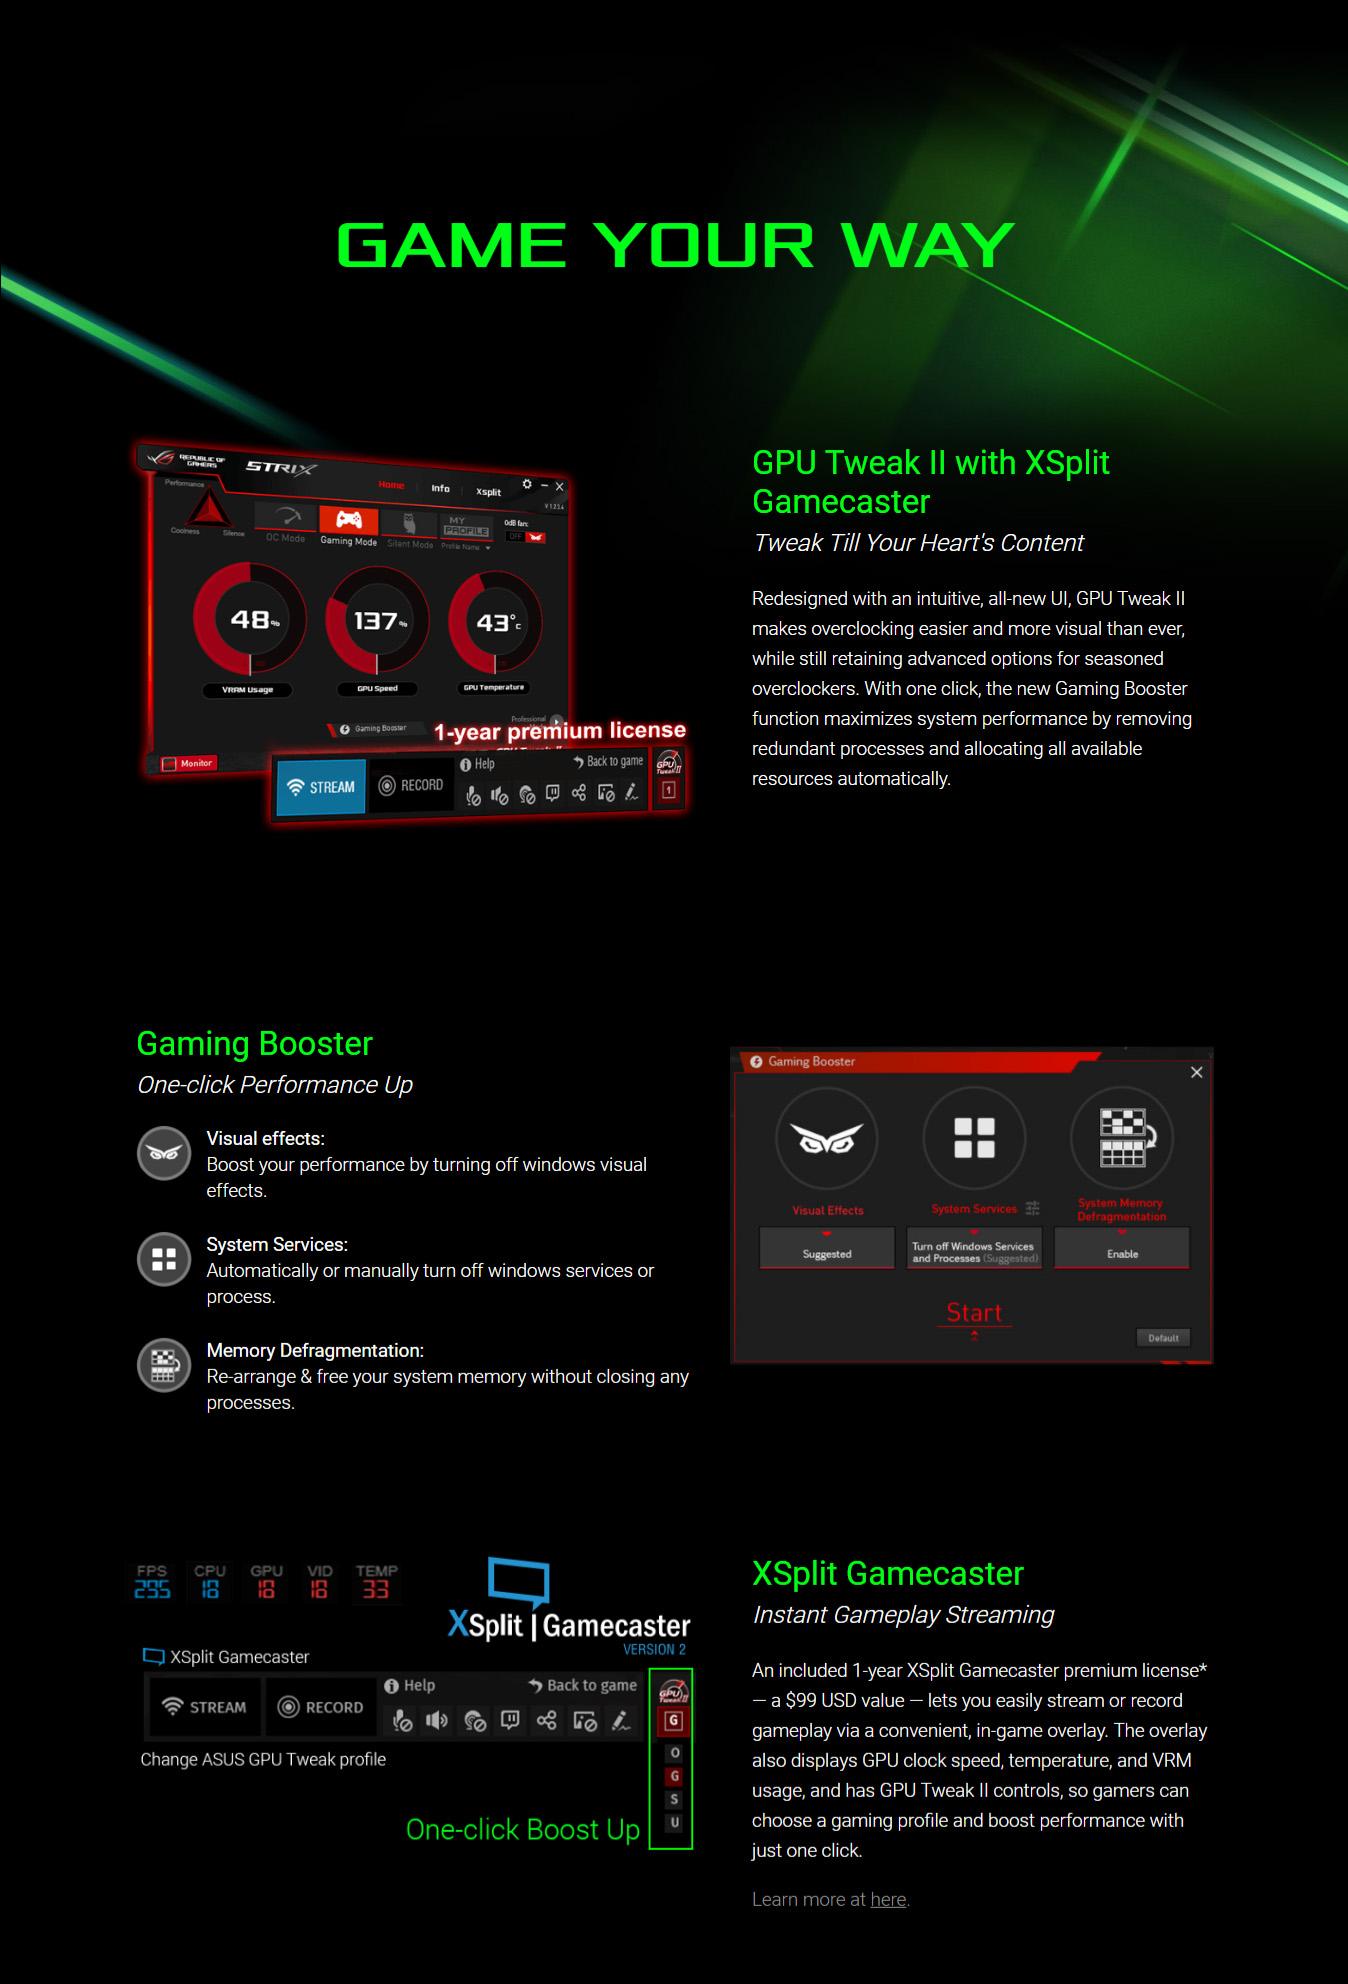 Asus Strix GTX 1060 OC Features